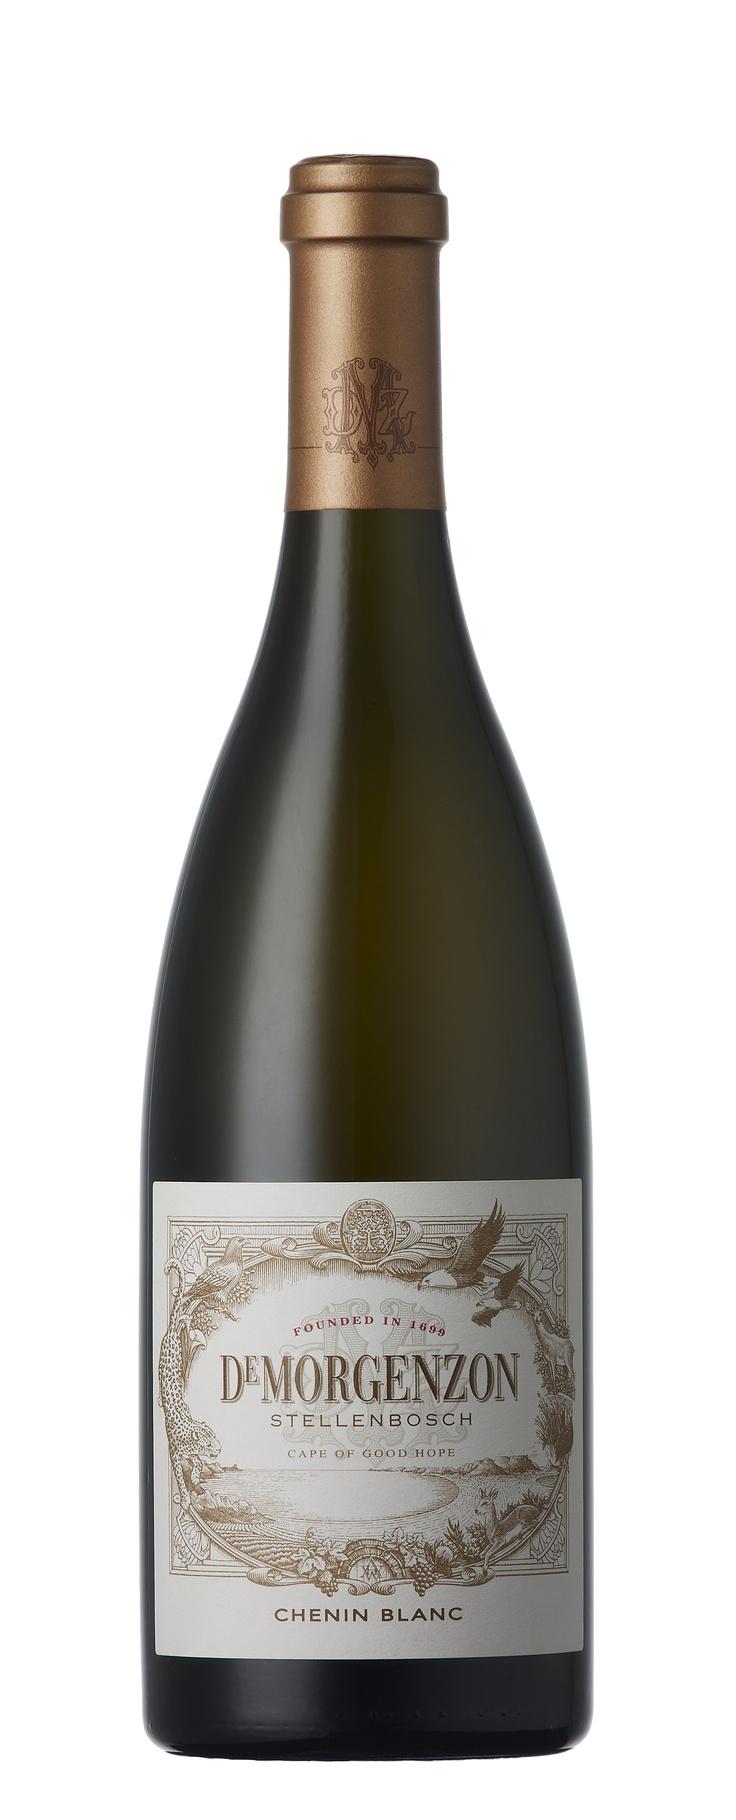 2005 De Morgenzon Chenin Blanc ex-Nederburg Auction ... best aged white I've tasted from South Africa (so far)